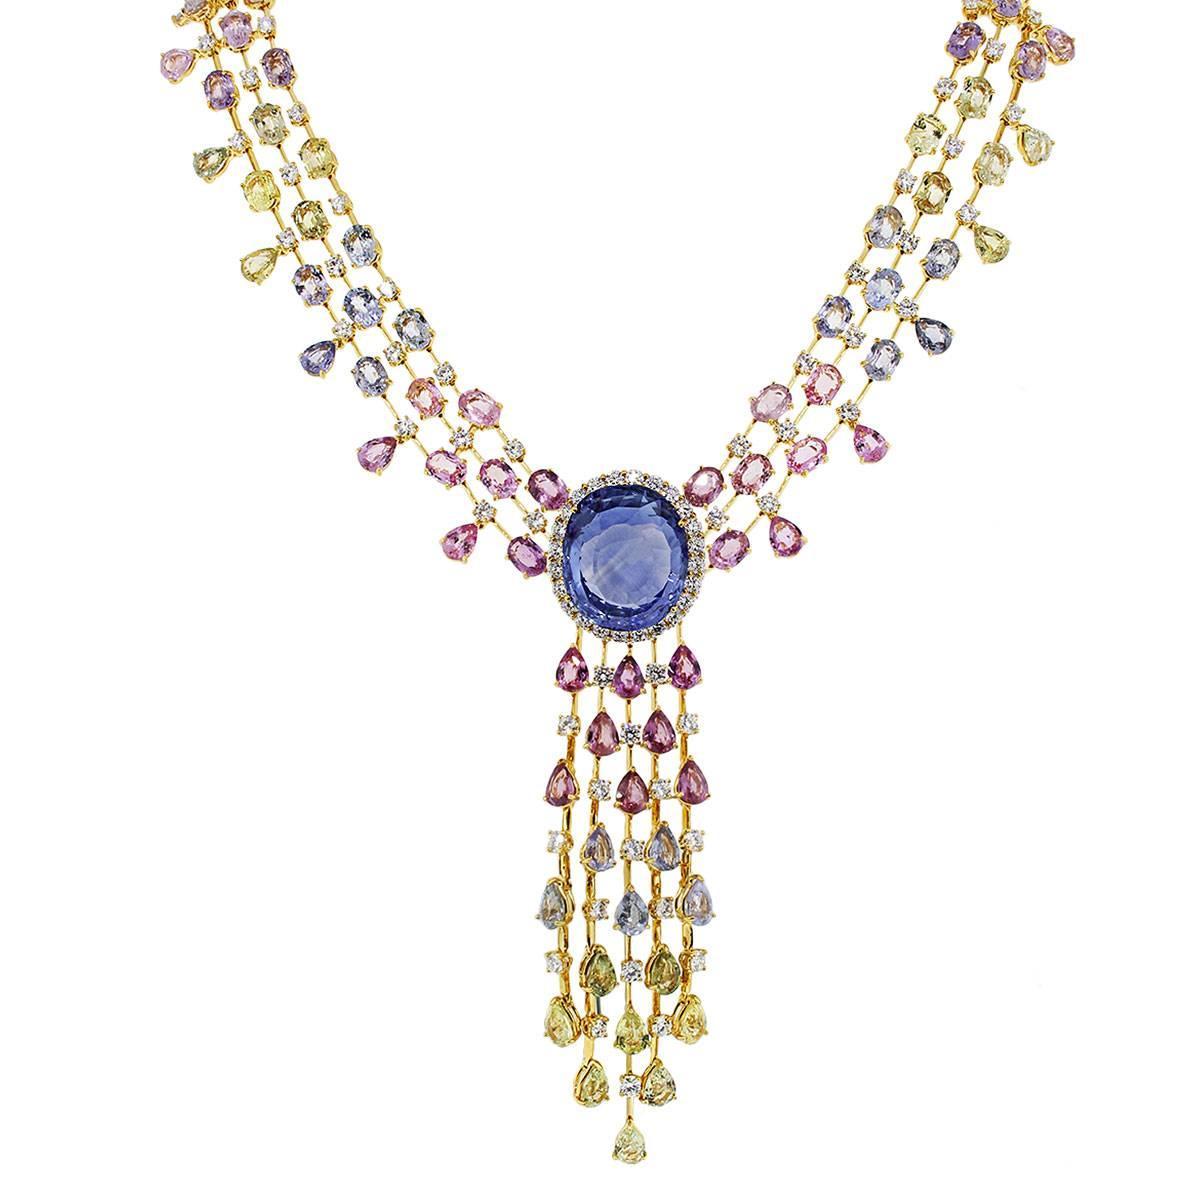 48.85 Carat Unheated Sapphire and Diamond Necklace